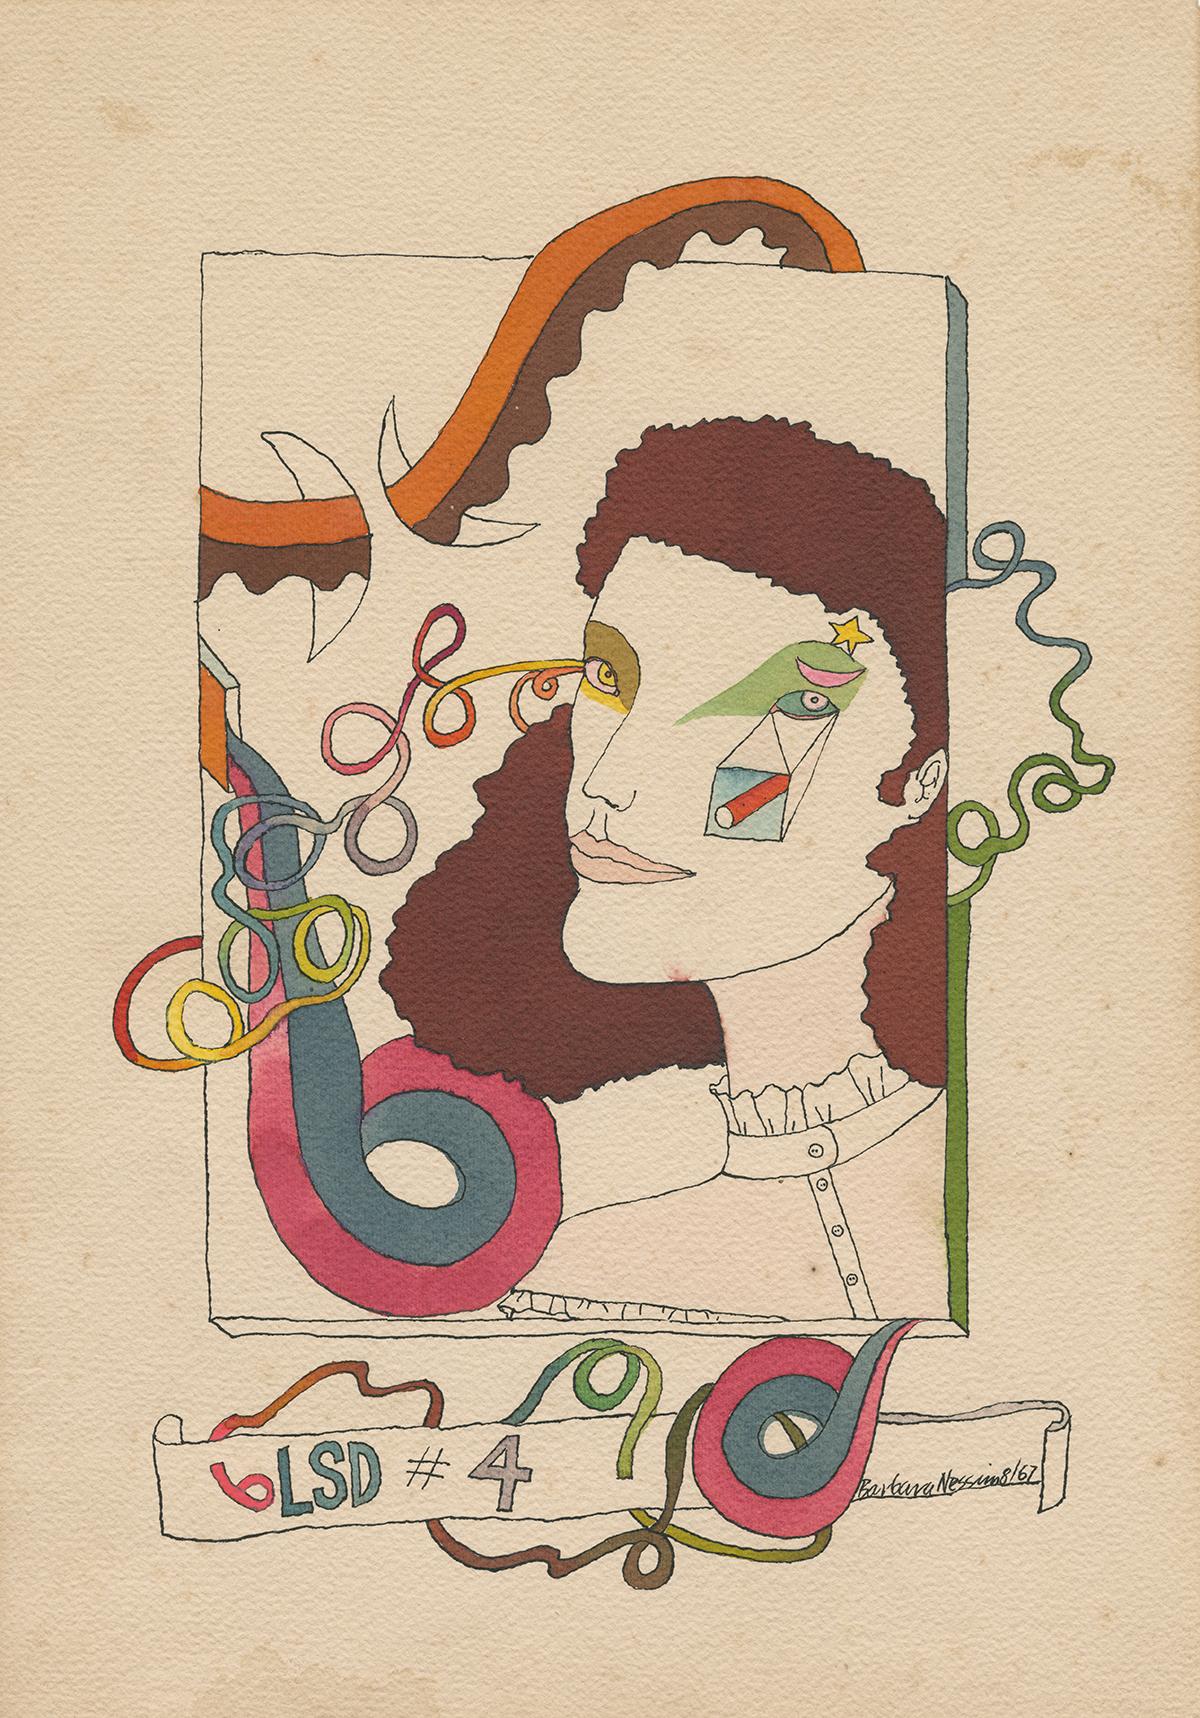 <i>LSD on the Move No. 4</i>, 1967